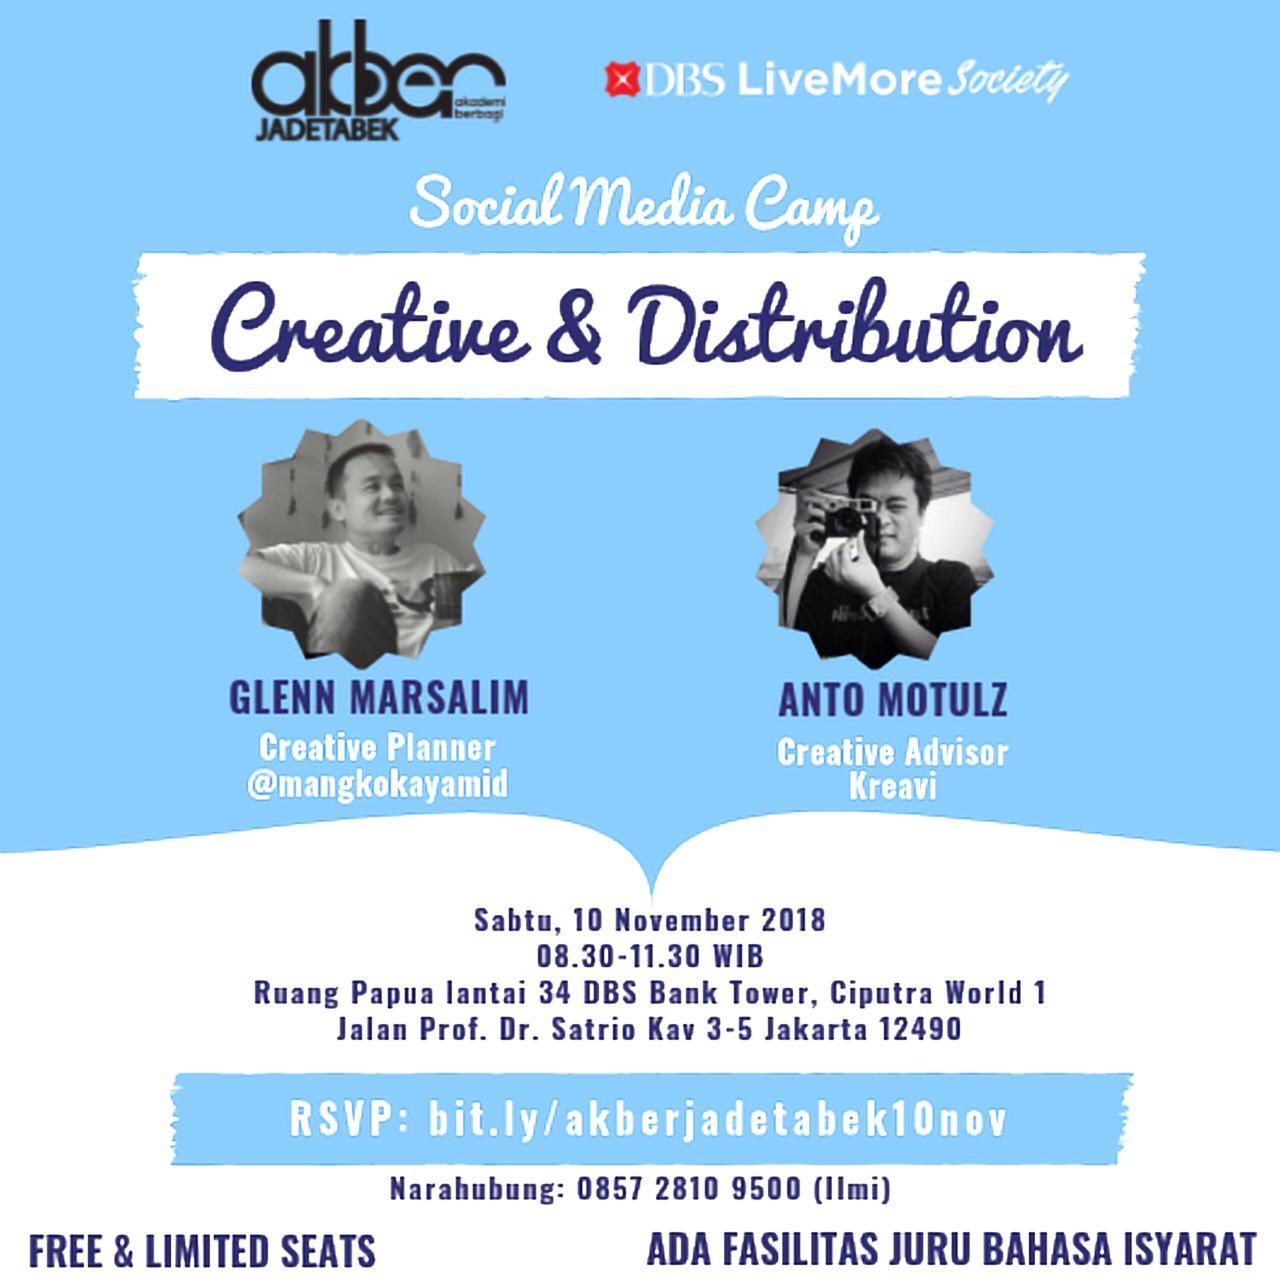 Jadetabek: Social Media Camp: Creative & Distribution